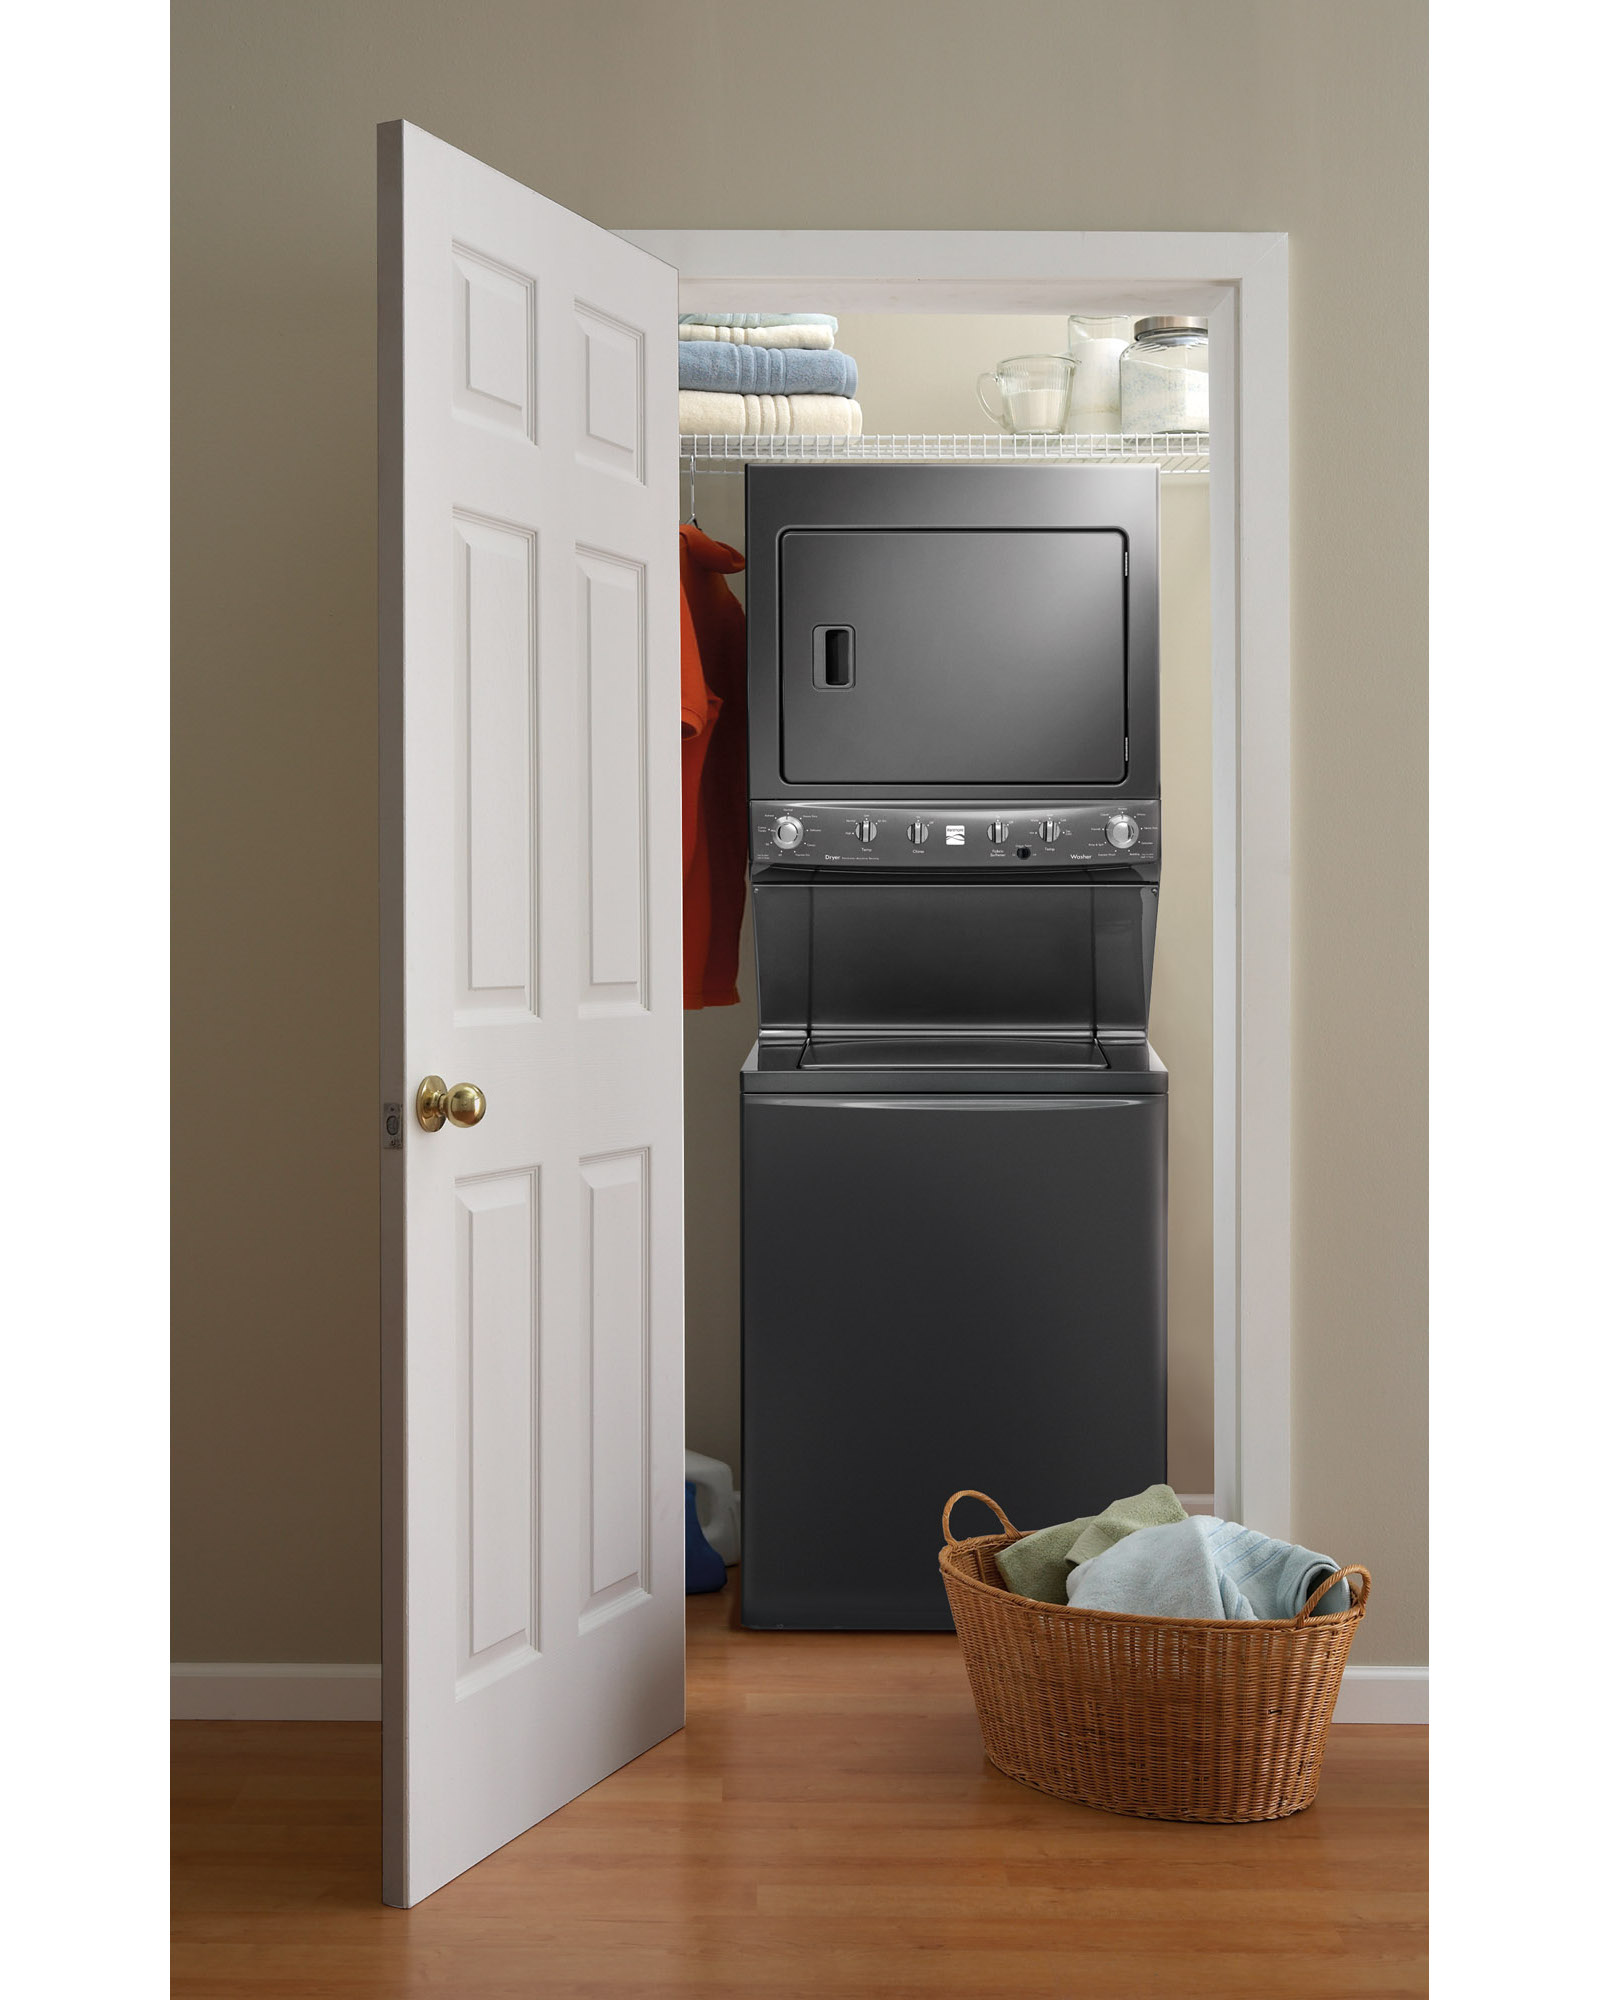 "Kenmore High Efficiency 27"" Super Capacity 3.8 cu. ft. Gas Laundry Center - Metallic"